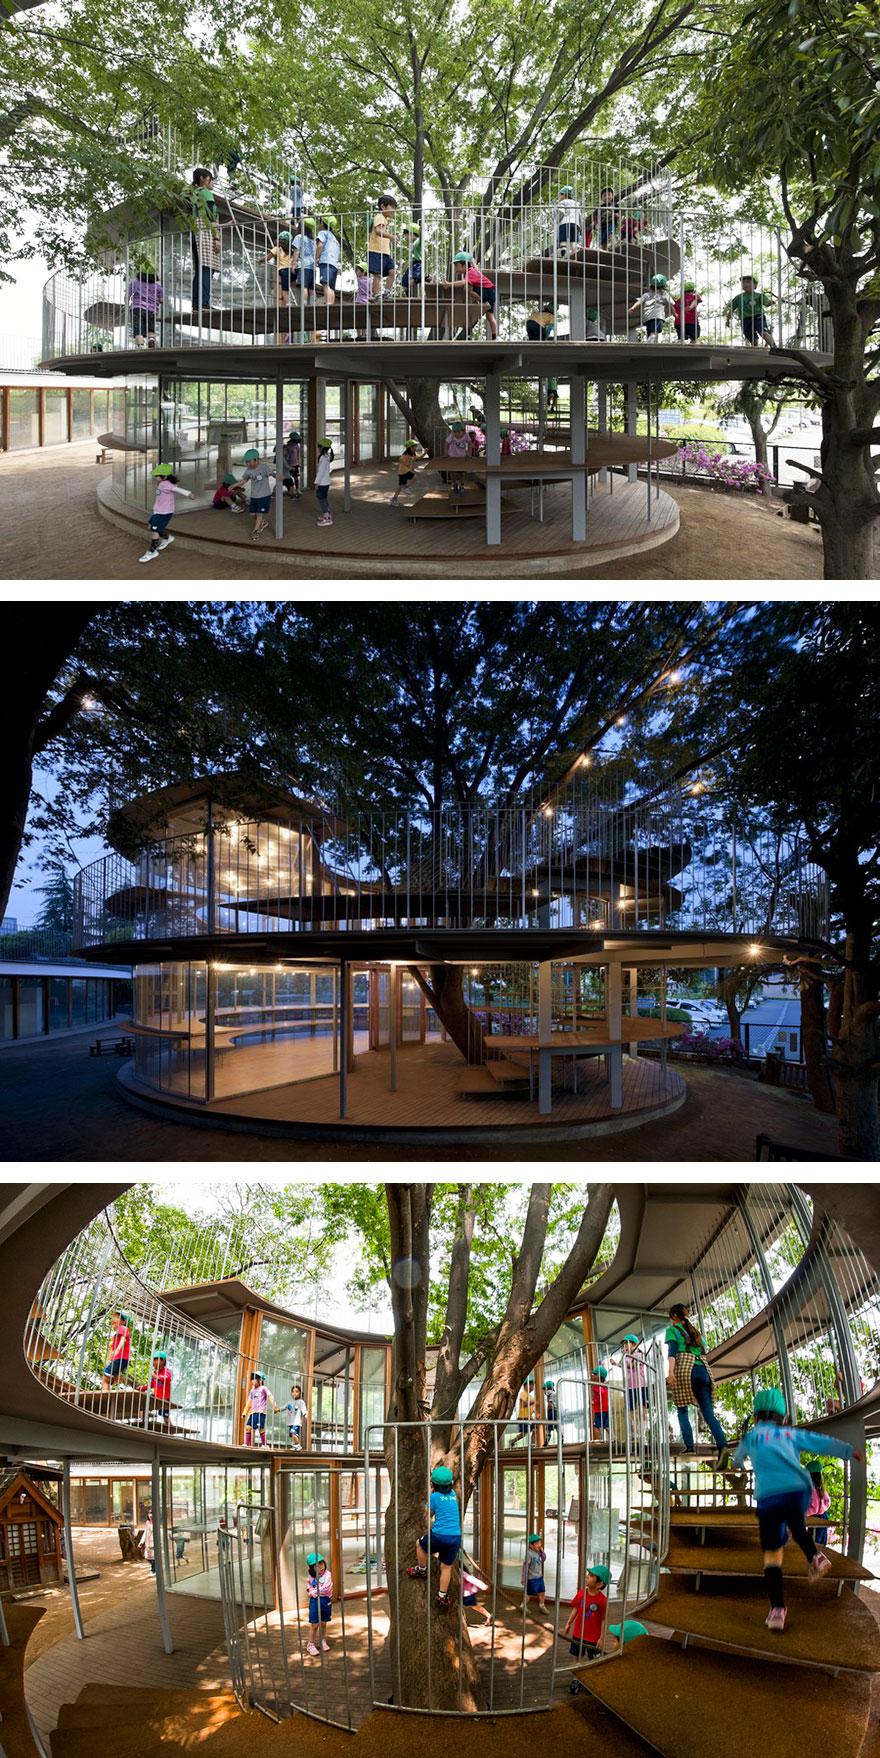 architecture-around-the-trees-8__880